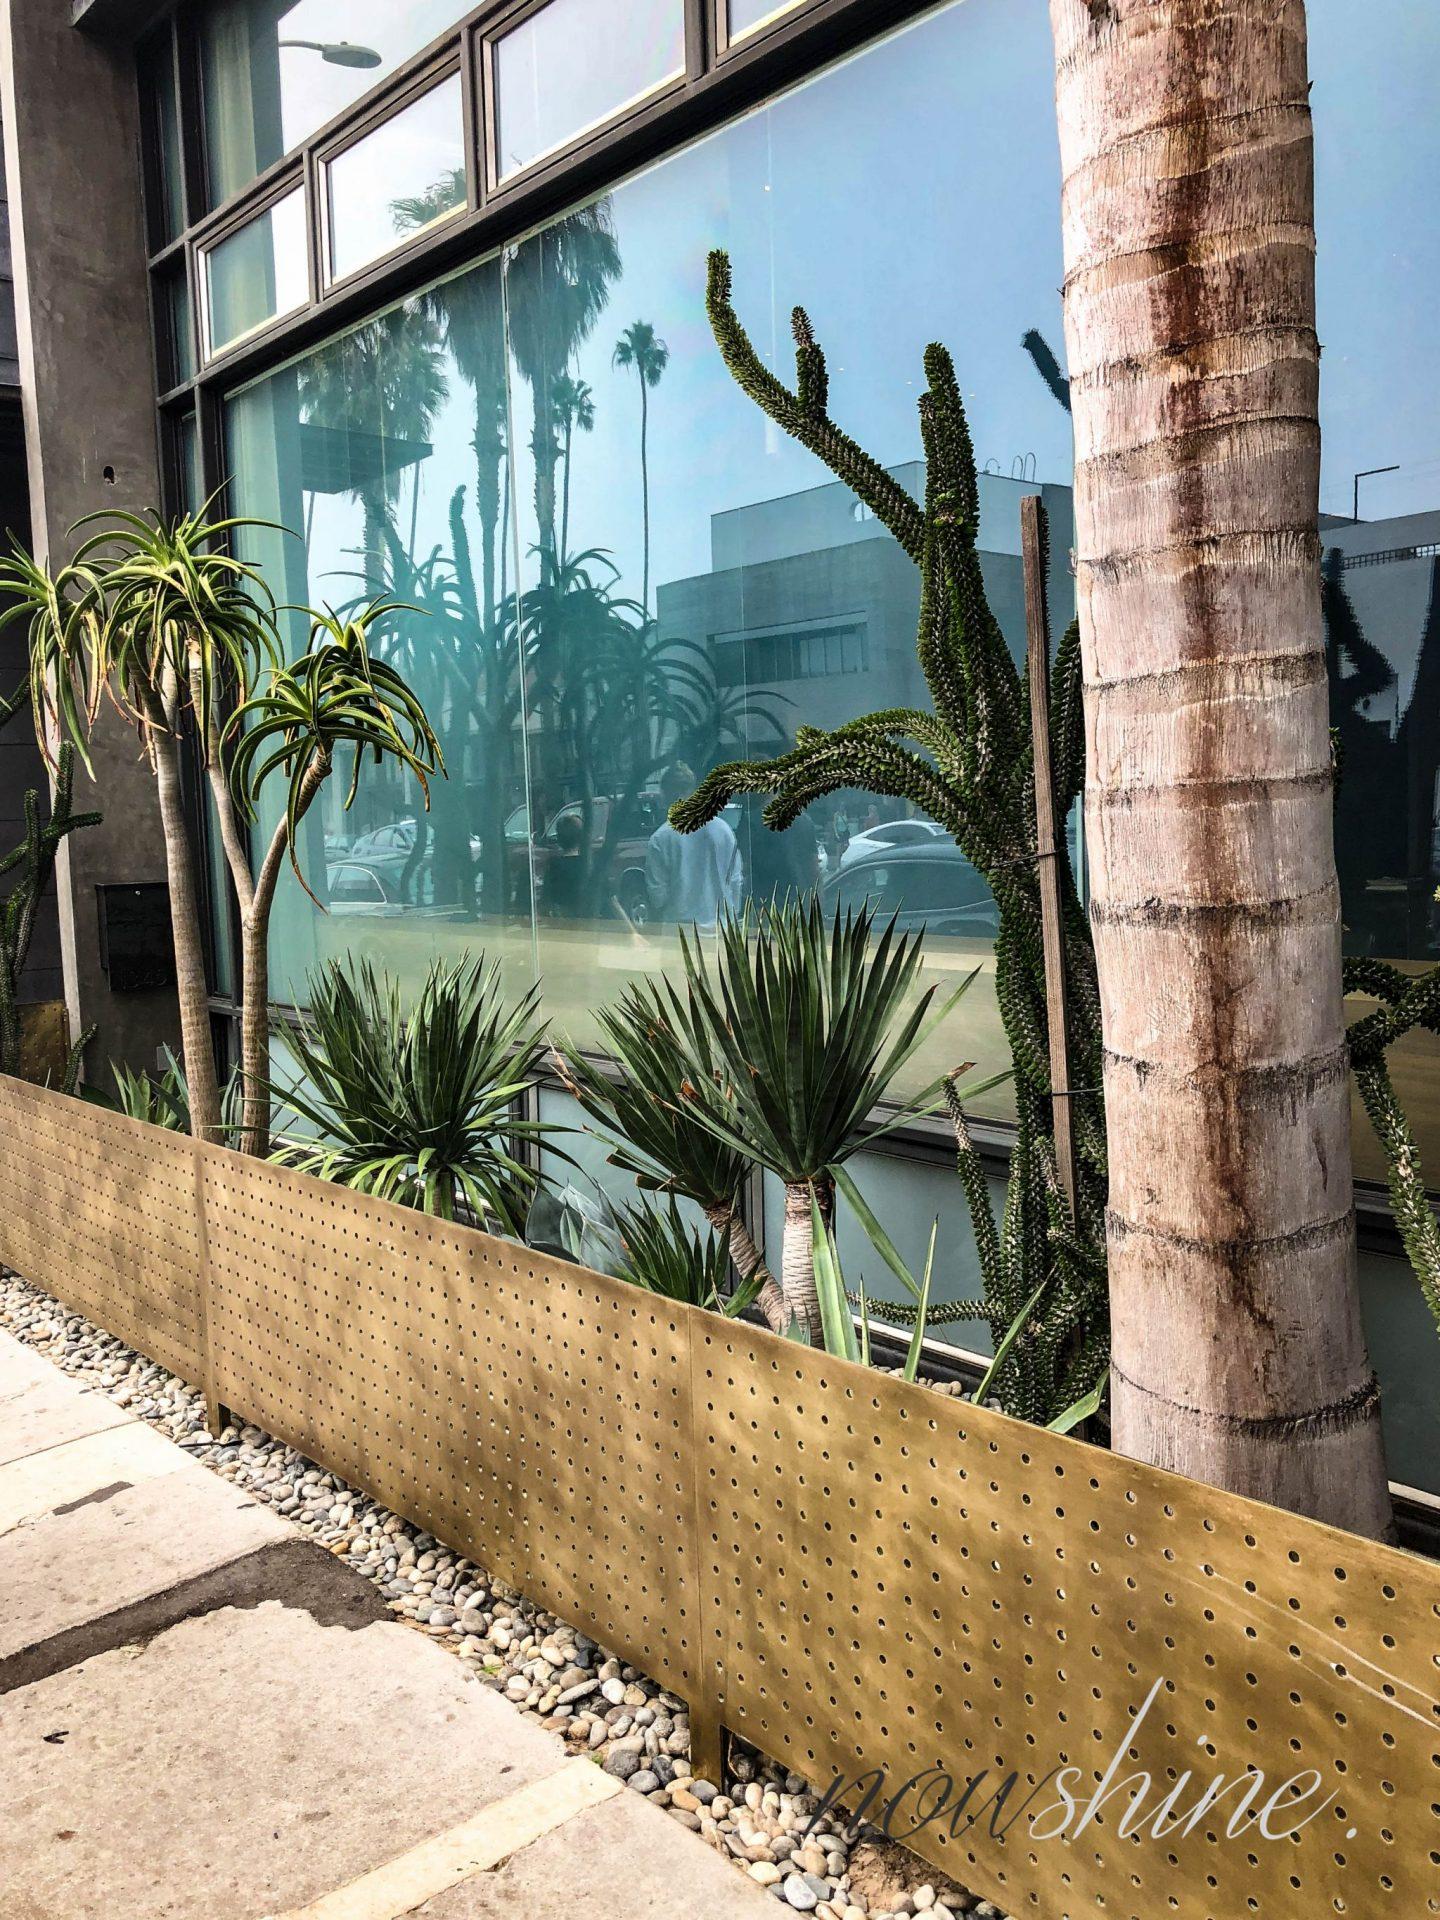 Venice Kalifornien - Abbot Kinney Blvd - Nowshine ü 40 Reiseblog